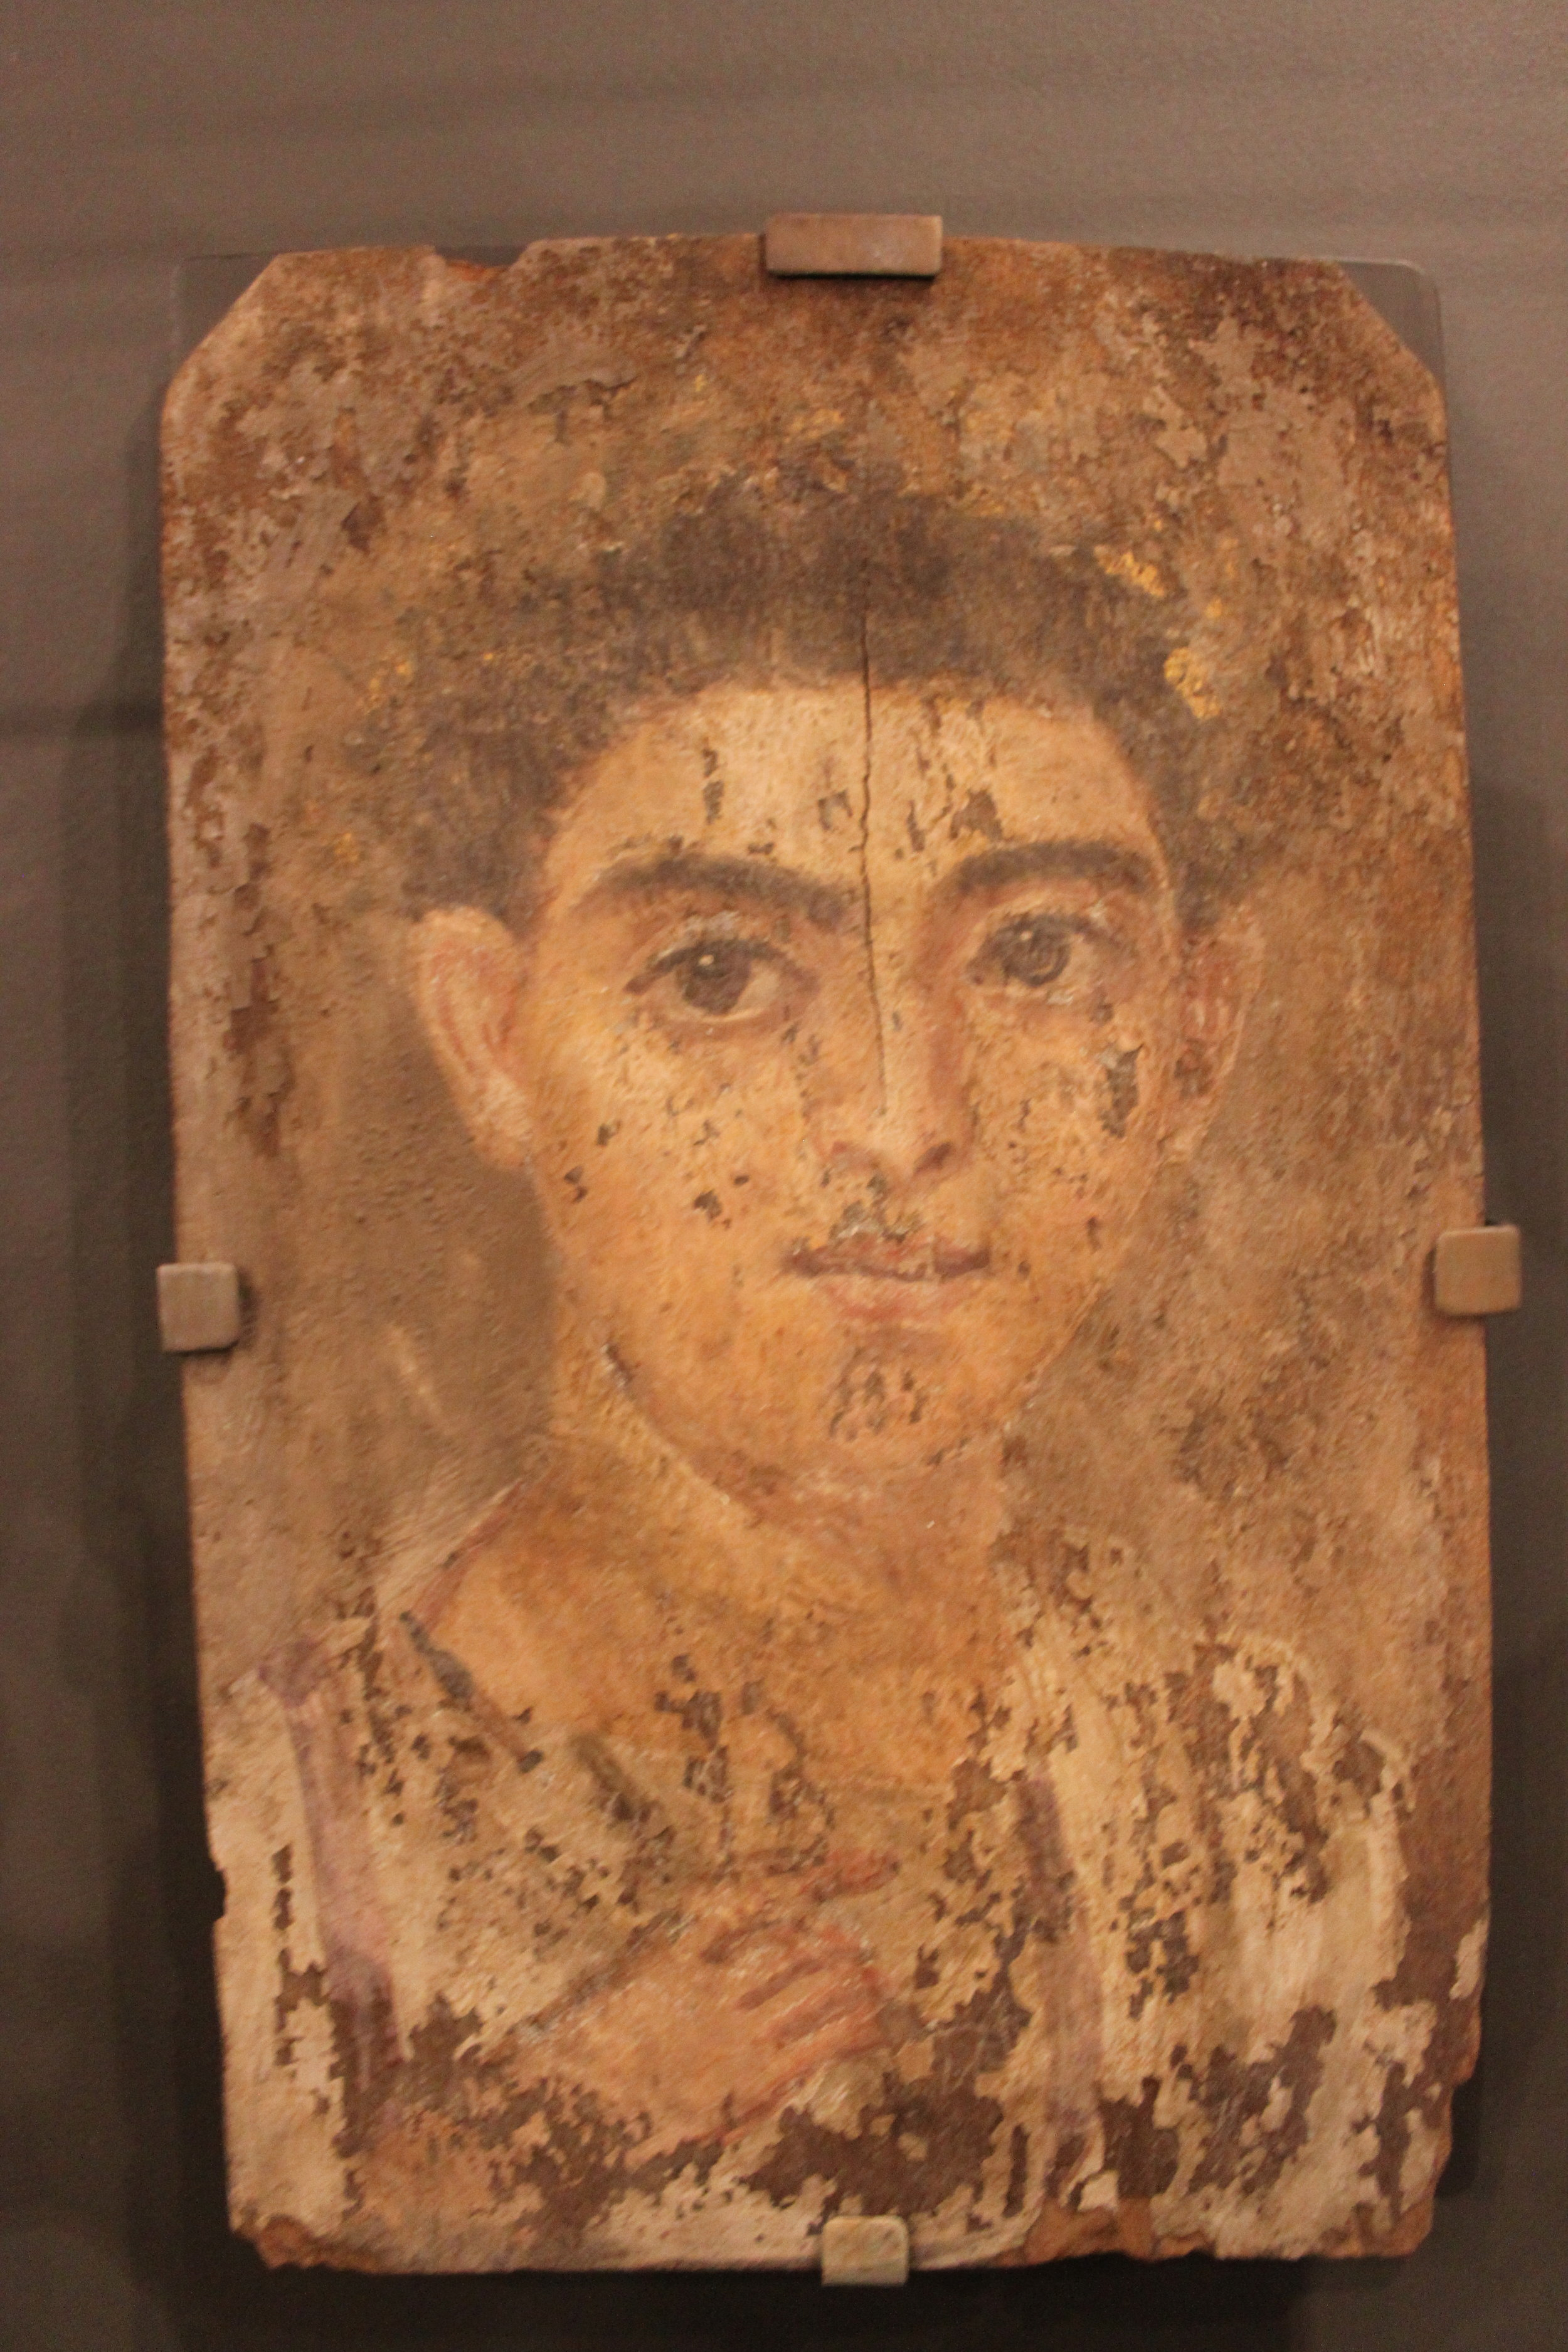 Mummy Portrait of a Young Boy - Roman period (30 BCE  - 295 CE)